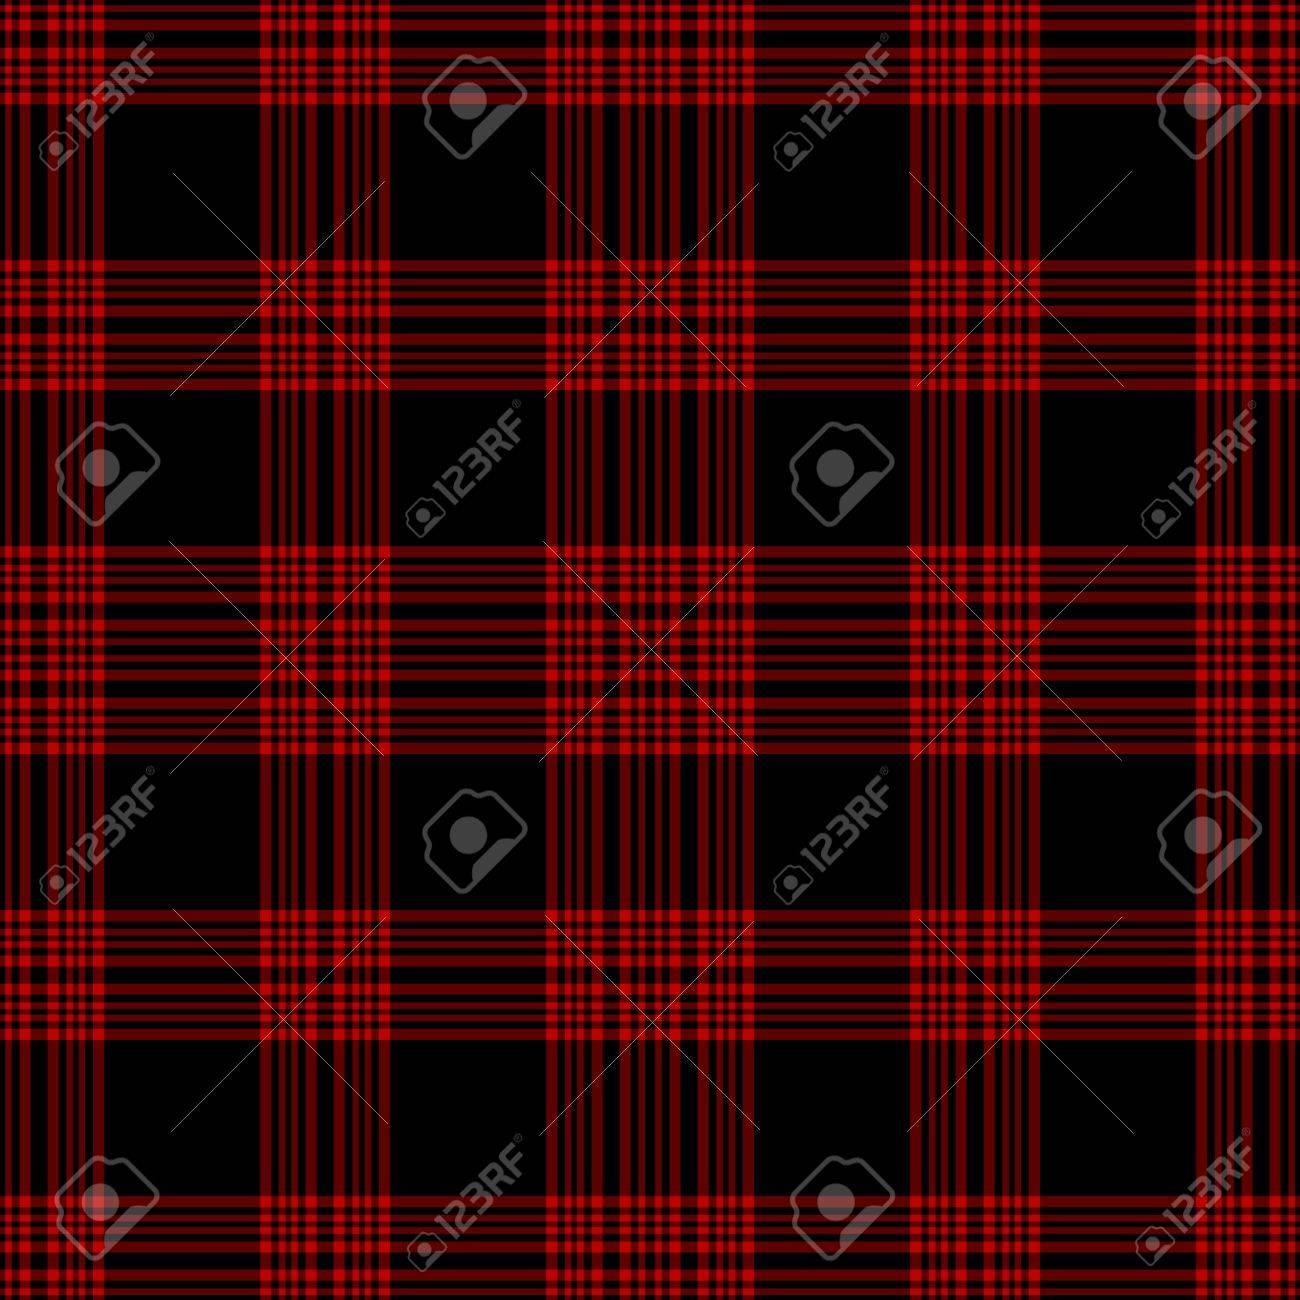 Seamless Black & Red Plaid Stock Photo - 15685921